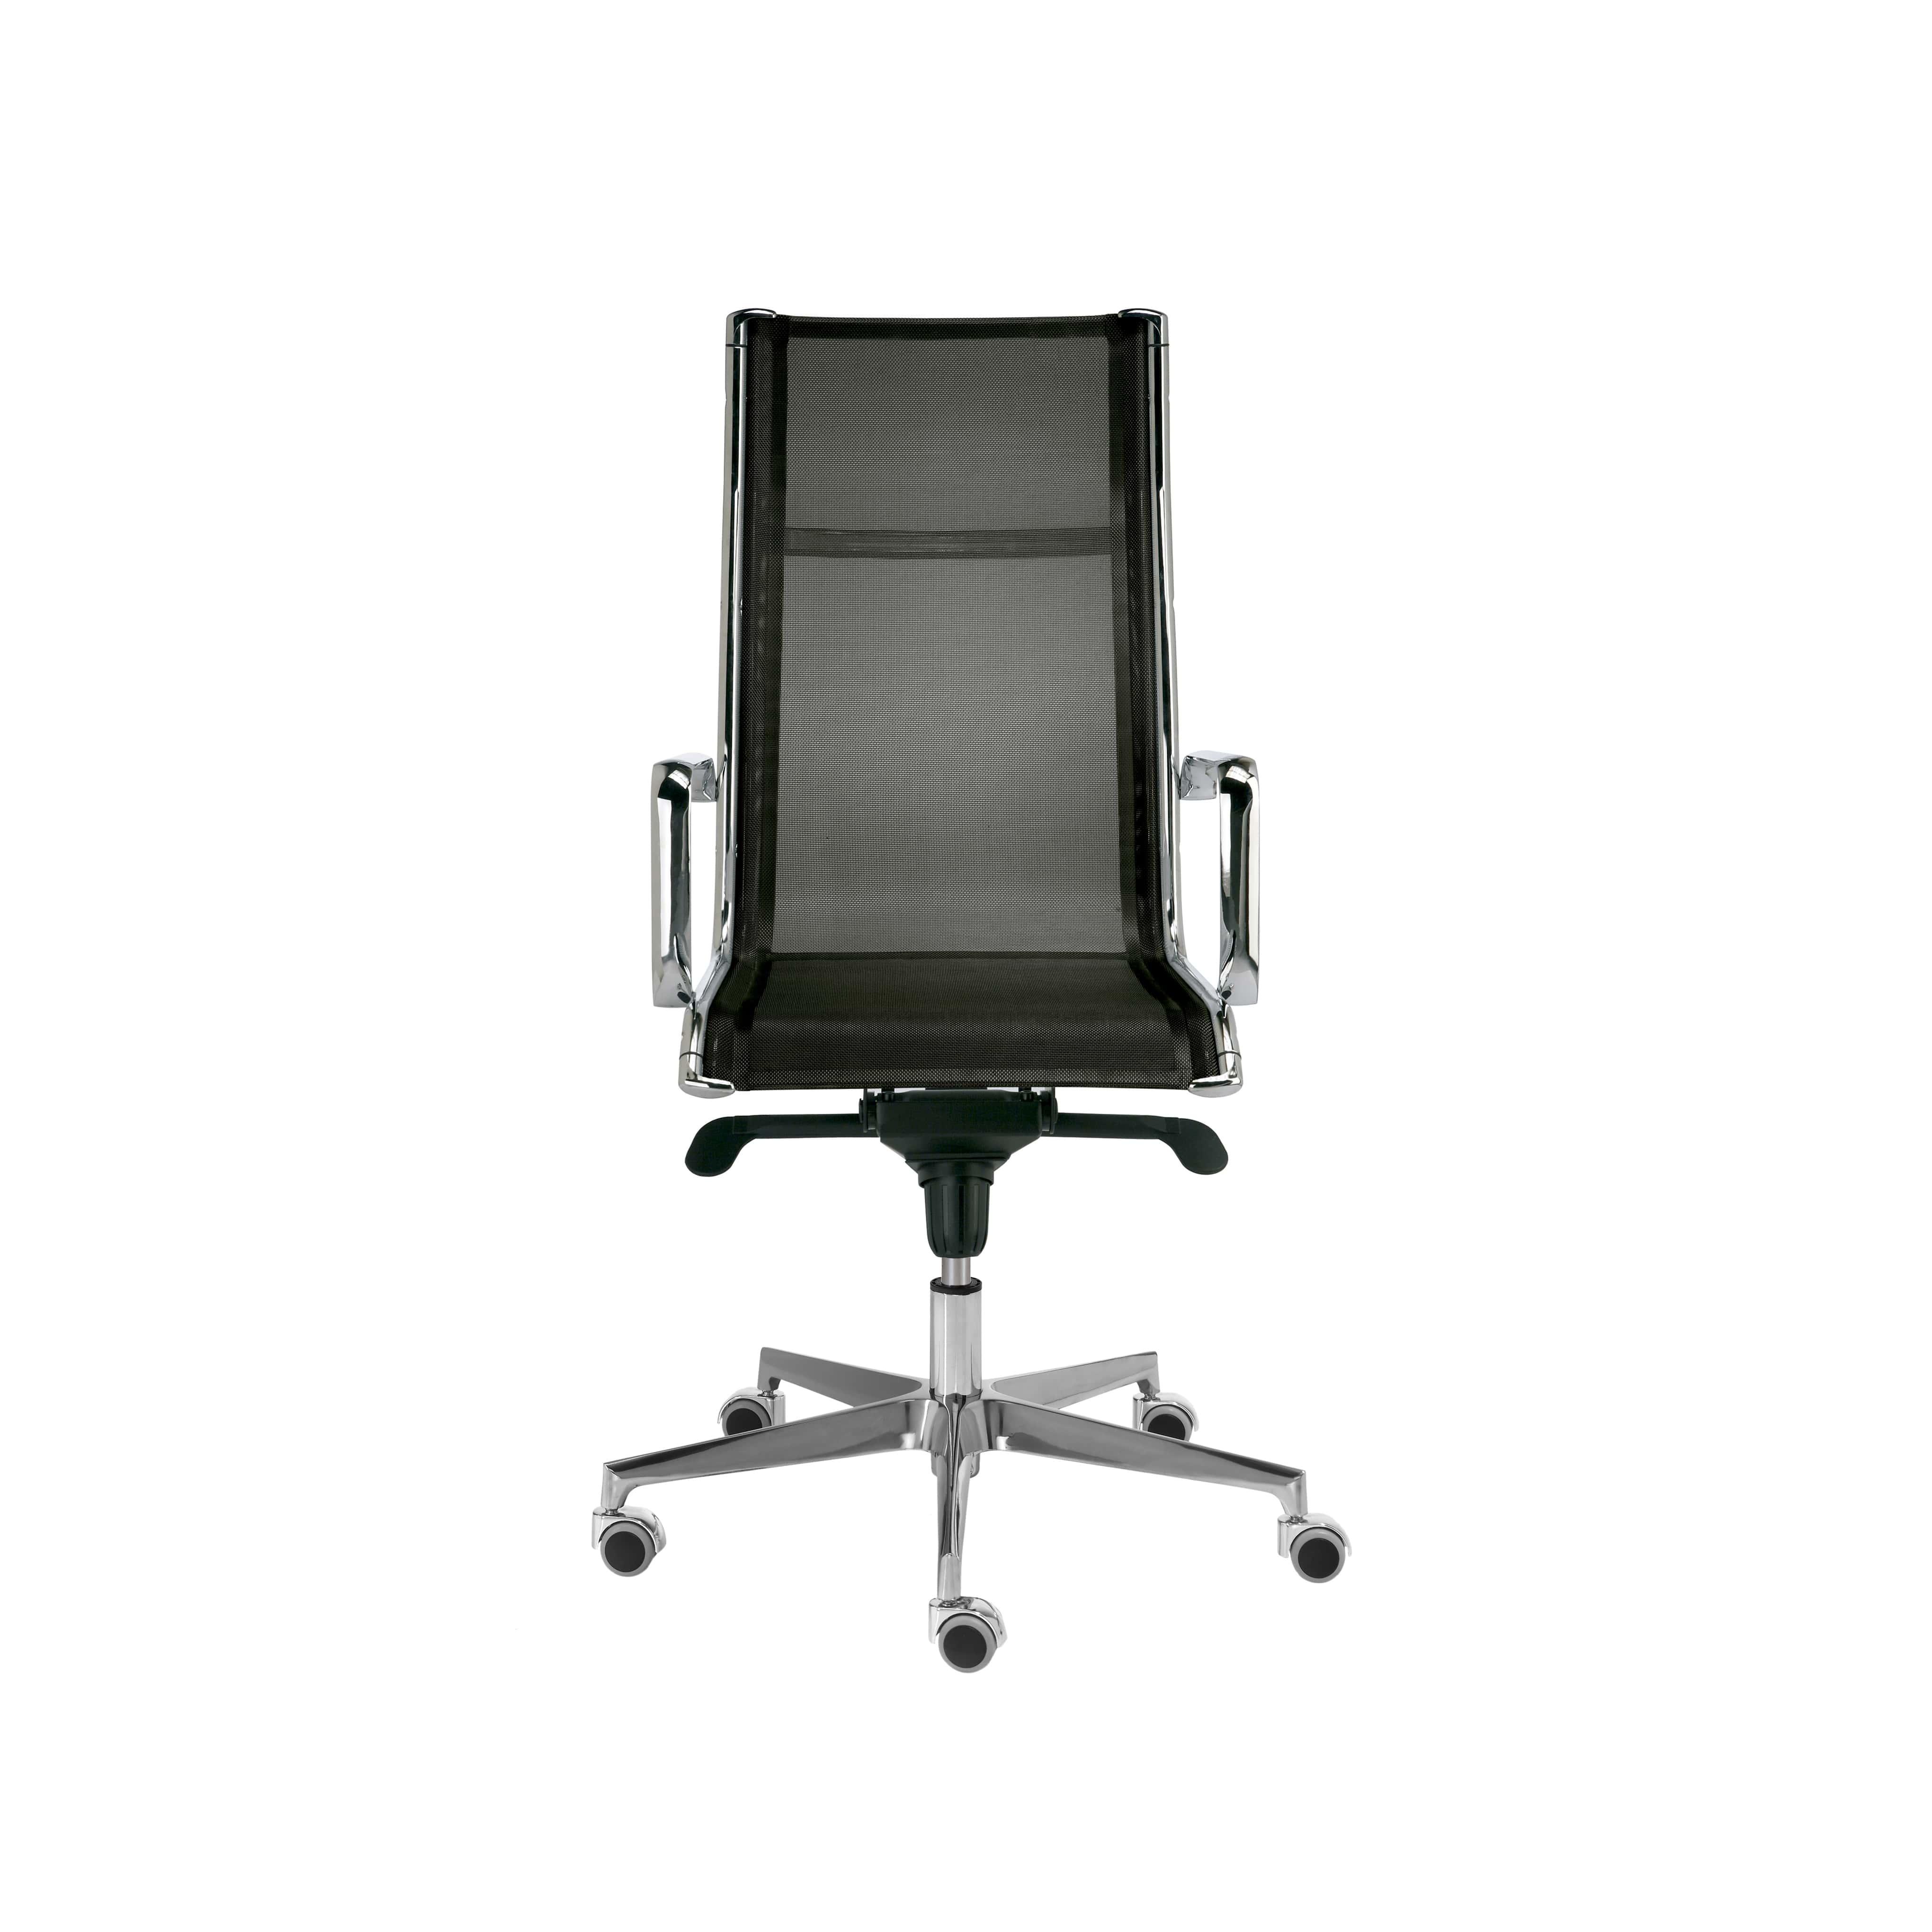 sillas-oficina-General-muebles-paco-caballero-454-5caf5d8e09c72